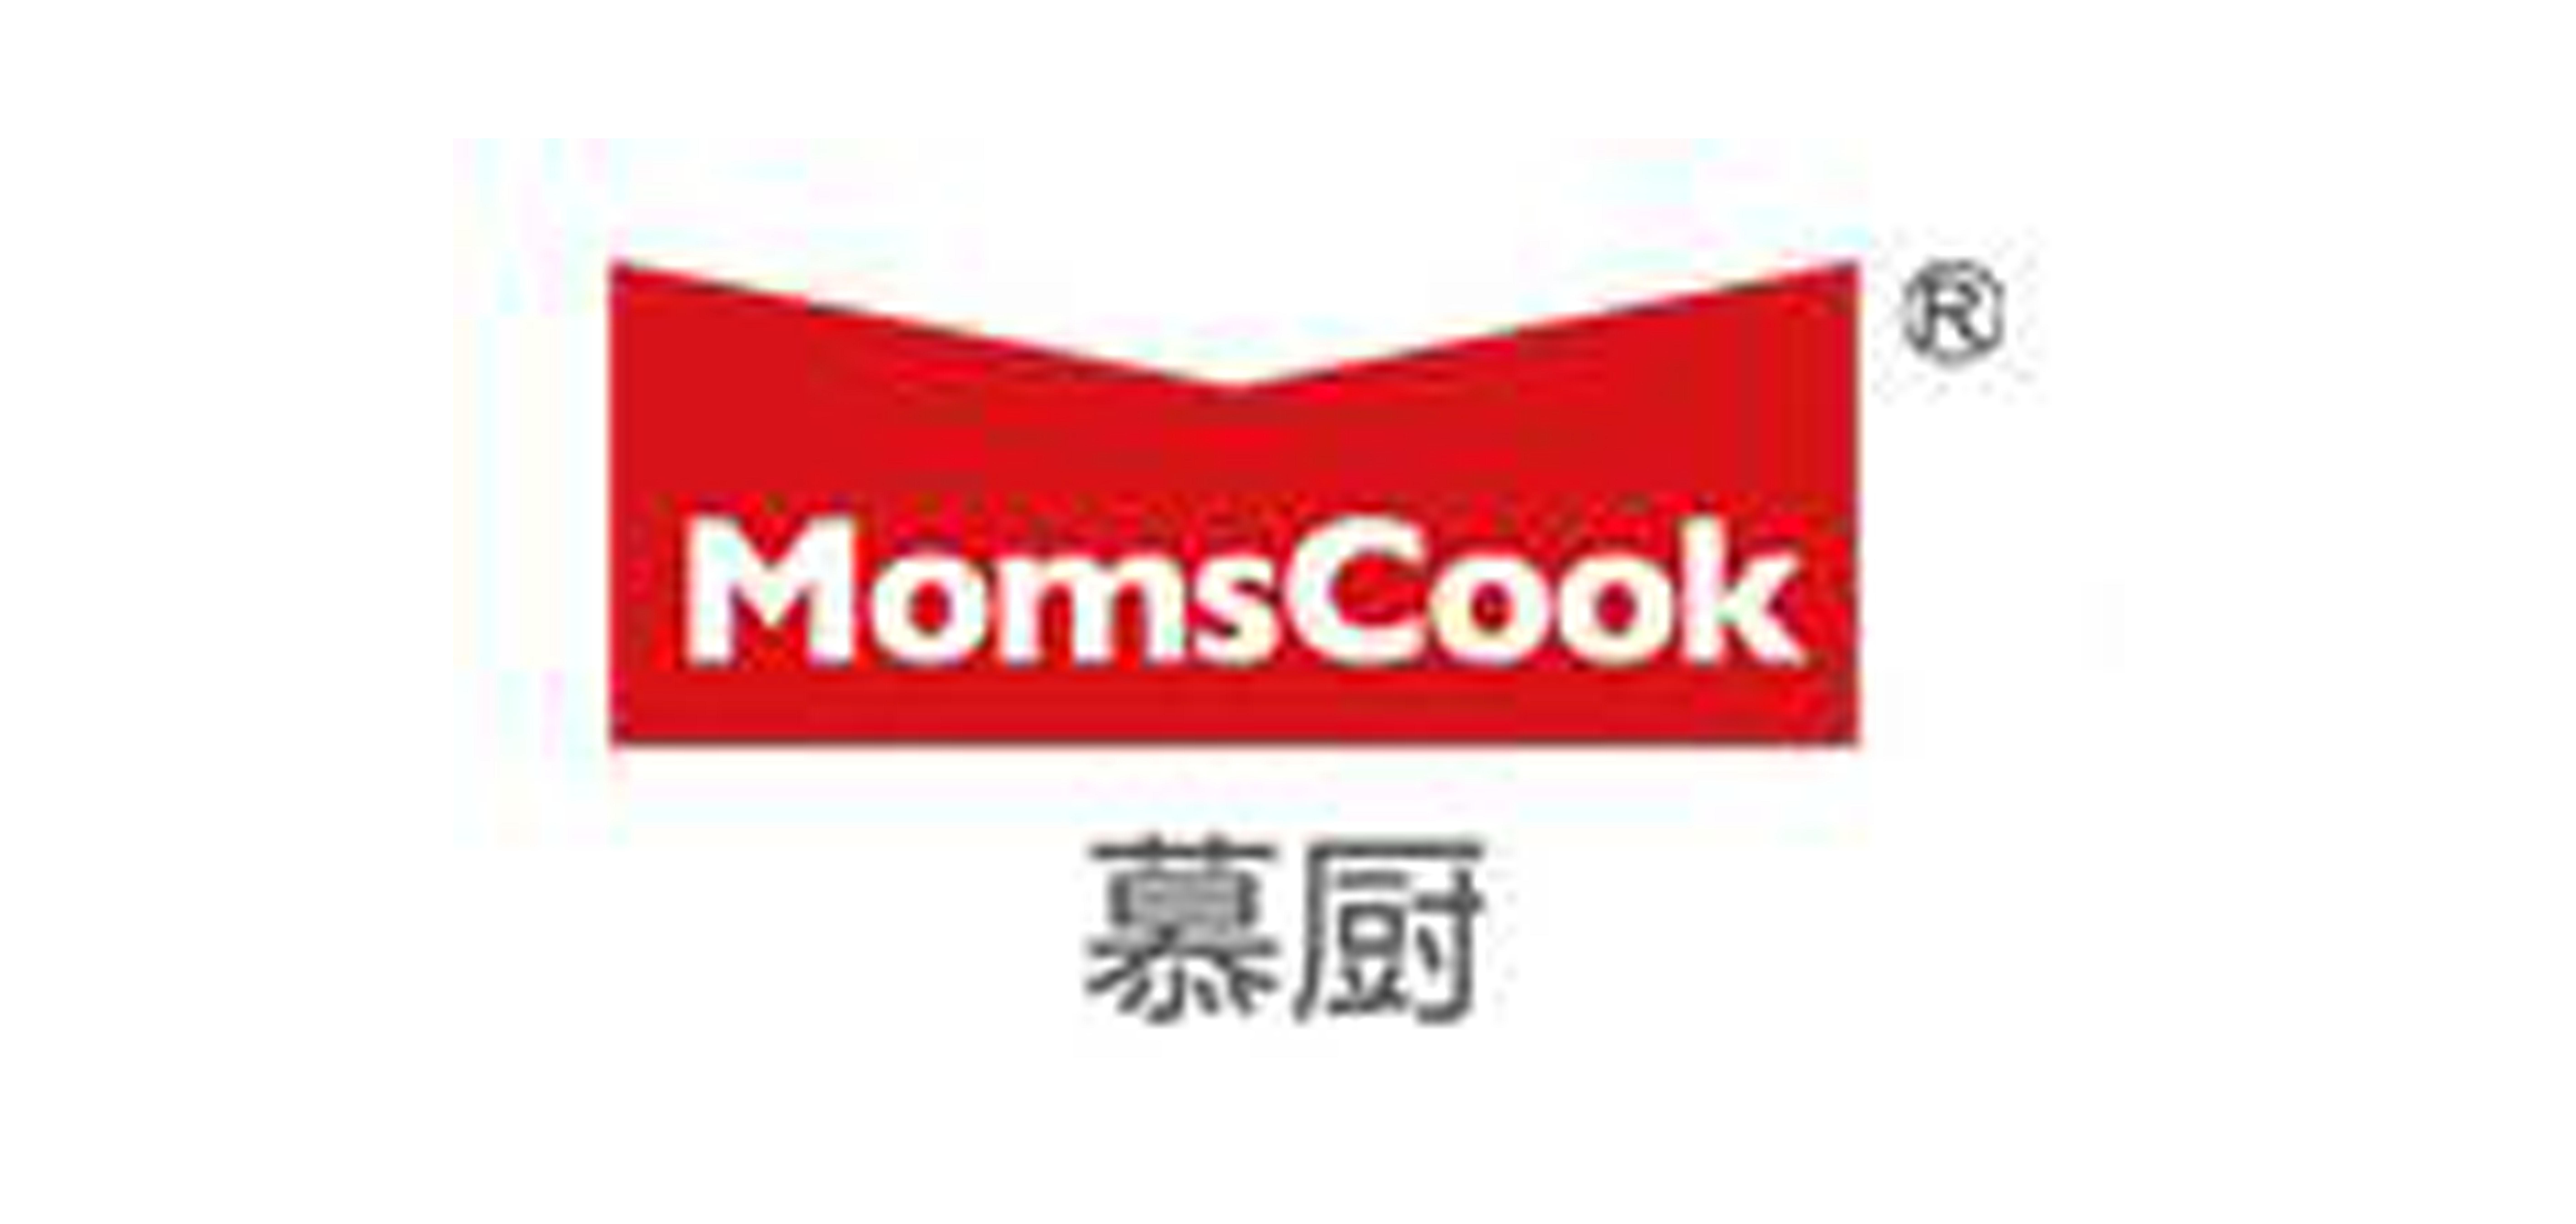 momscook是什么牌子_慕厨品牌怎么样?